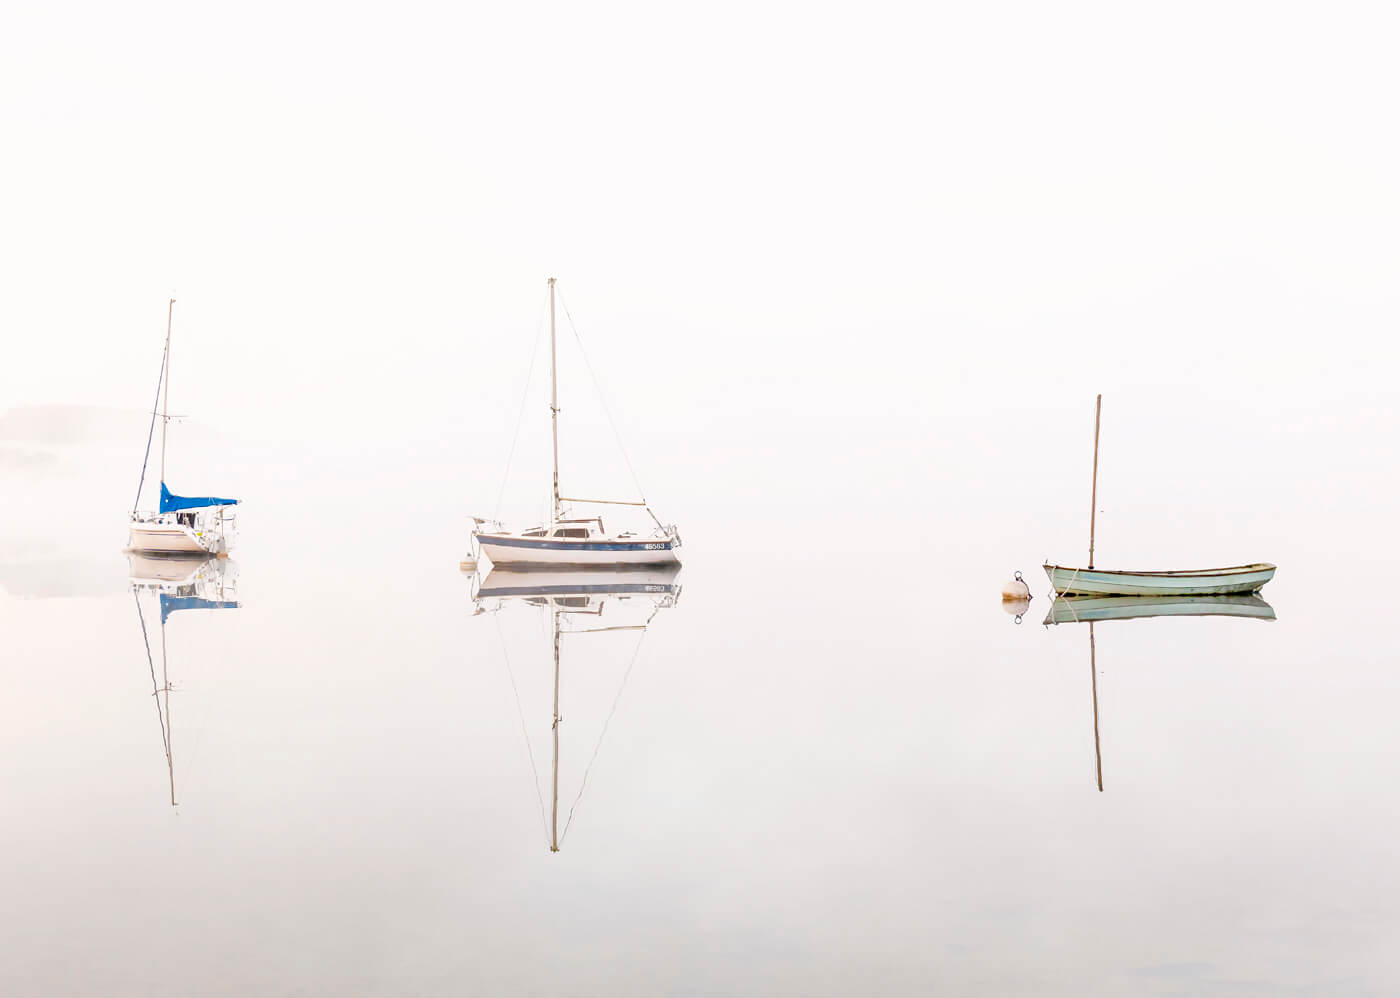 Misty Morning, Waterhead, Lake District